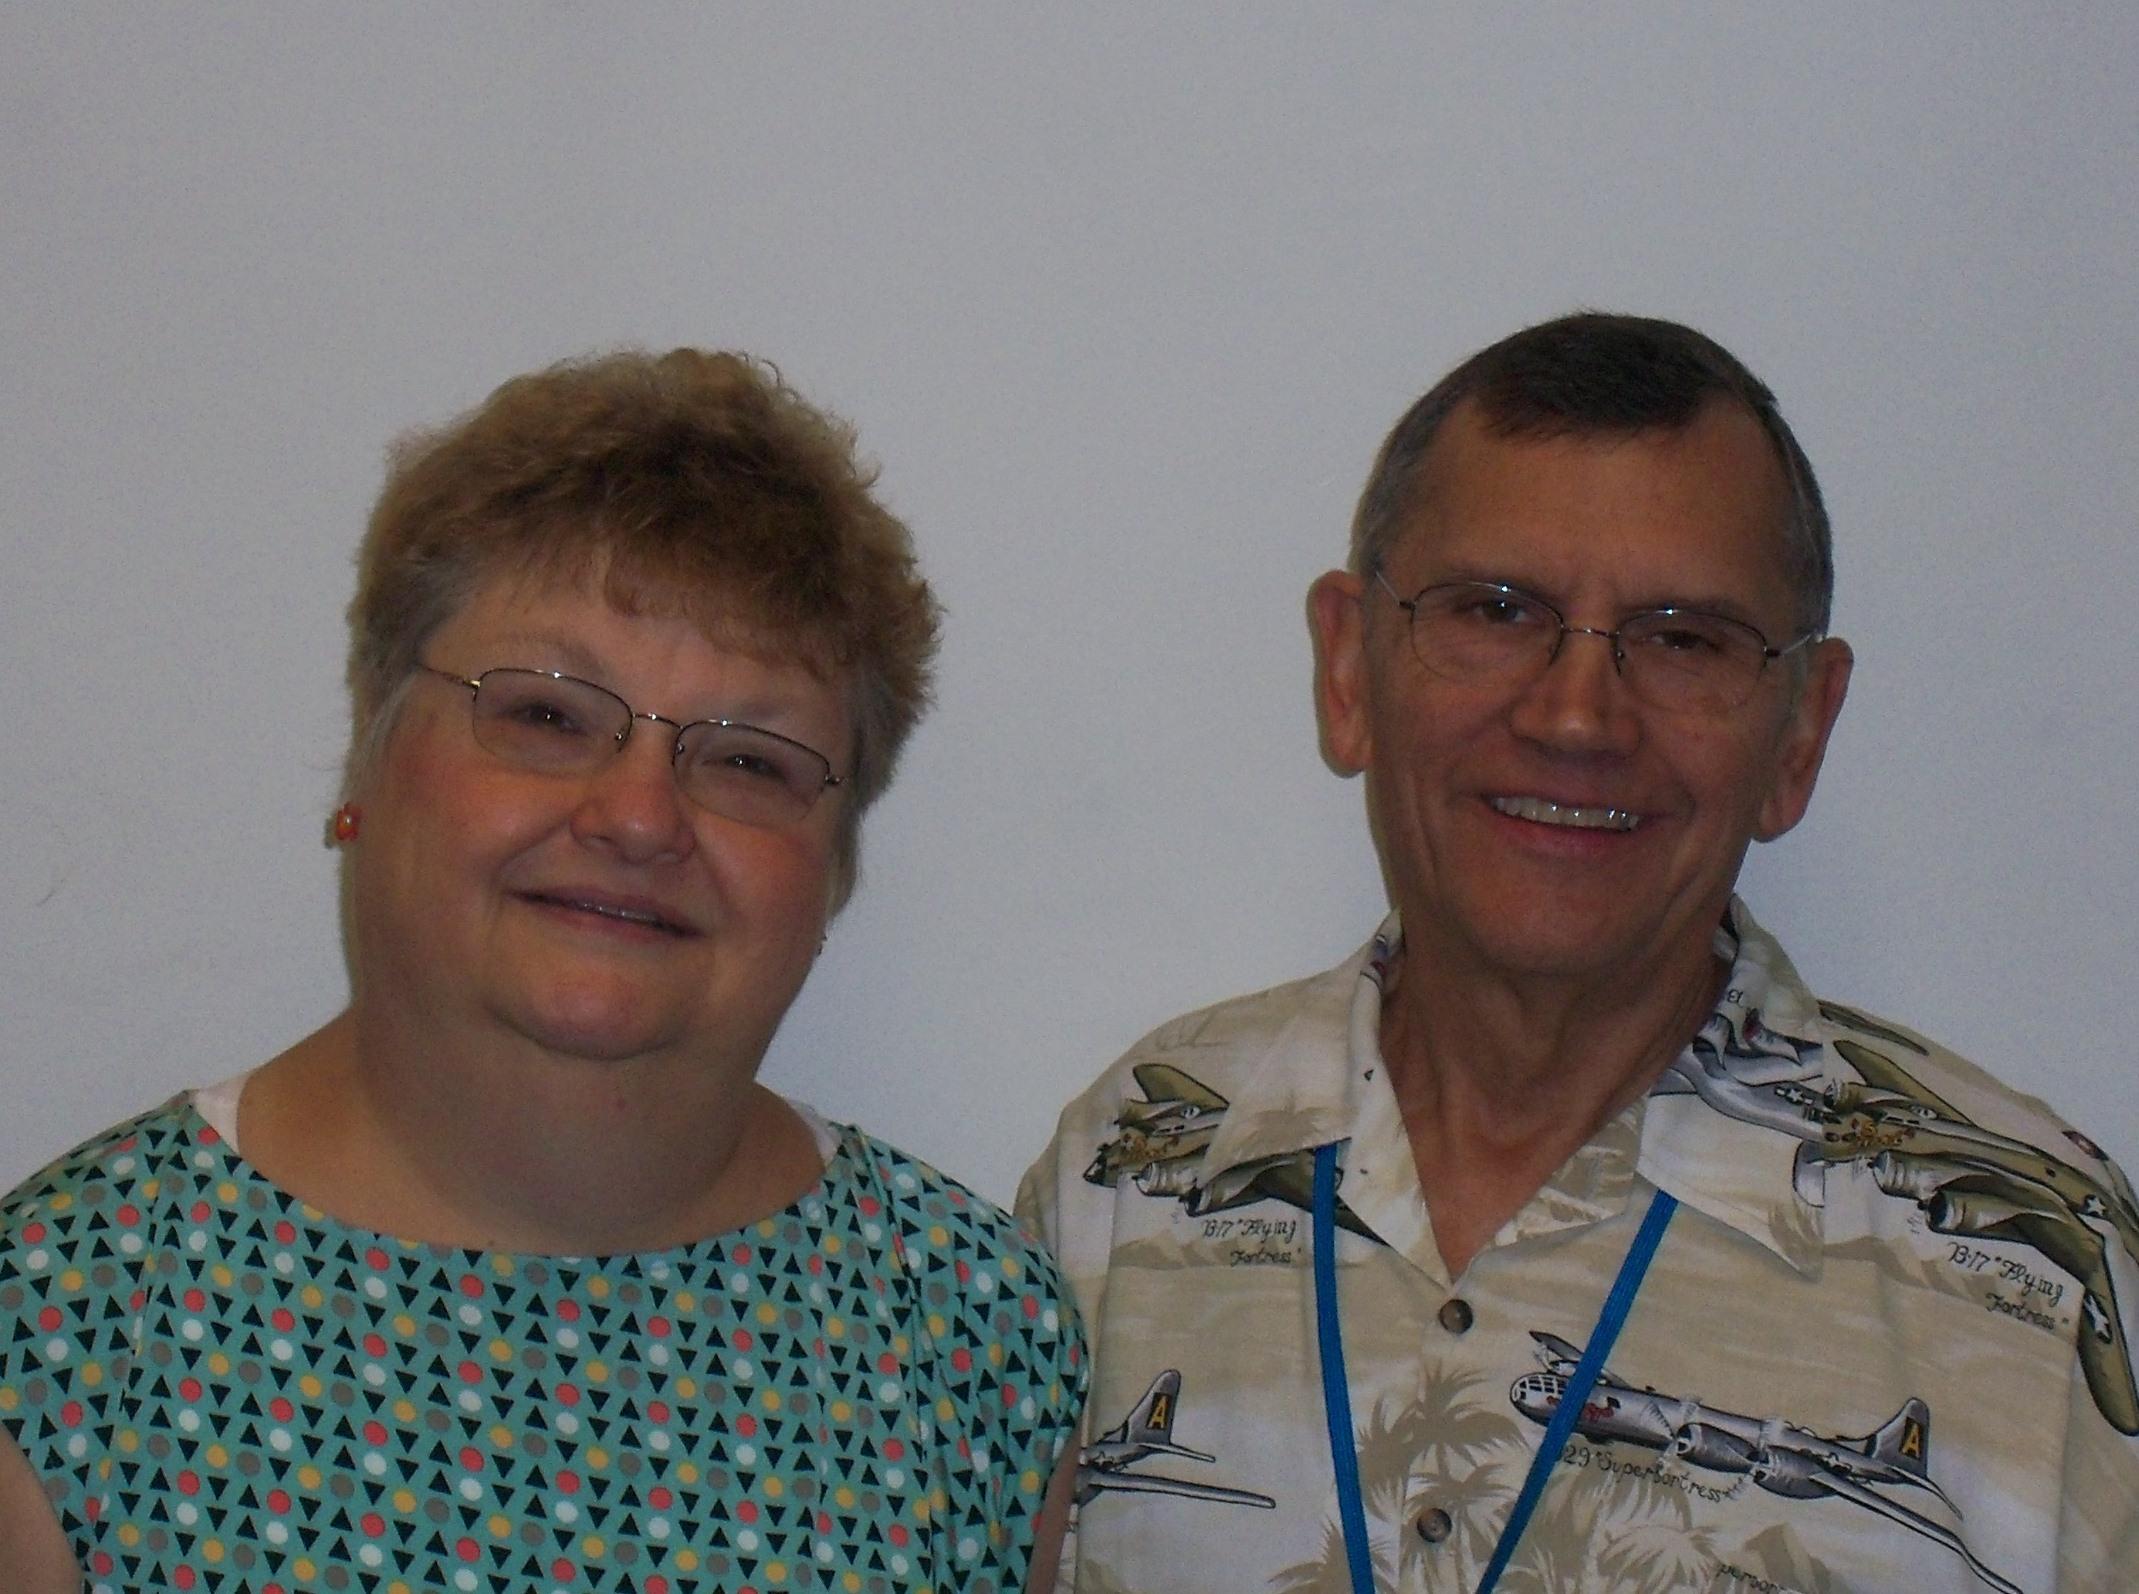 Tom and LIsa Bartholomew